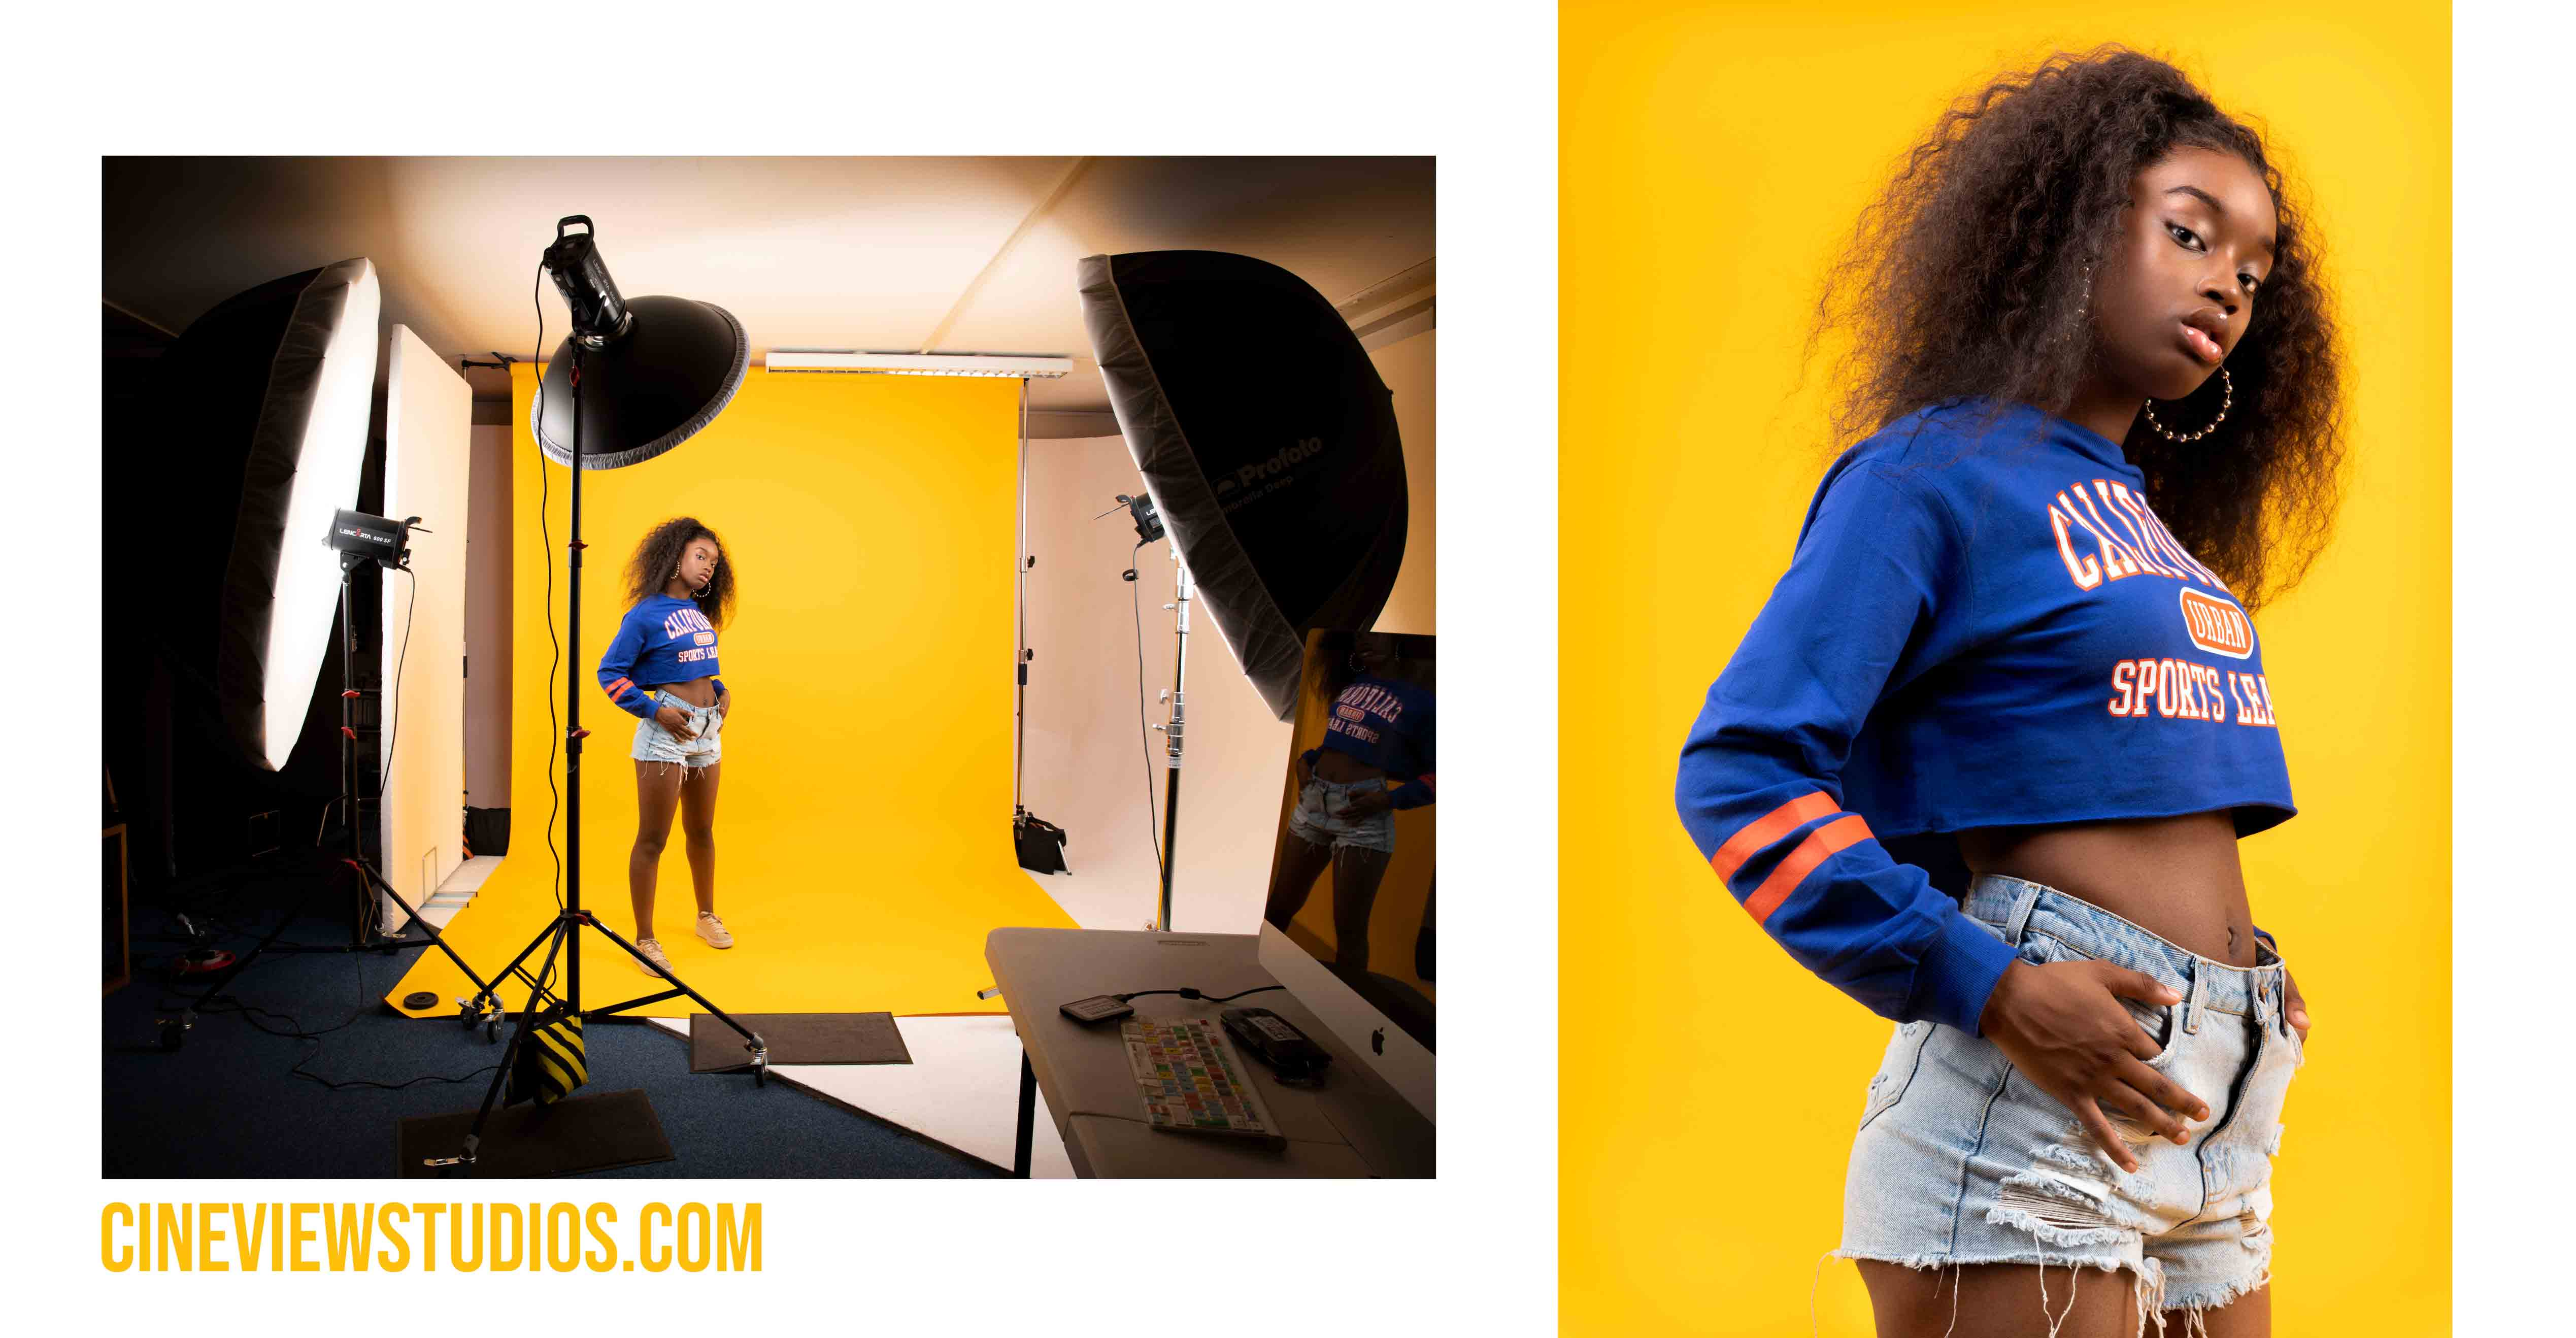 london-studio-hire-model-photoshoot